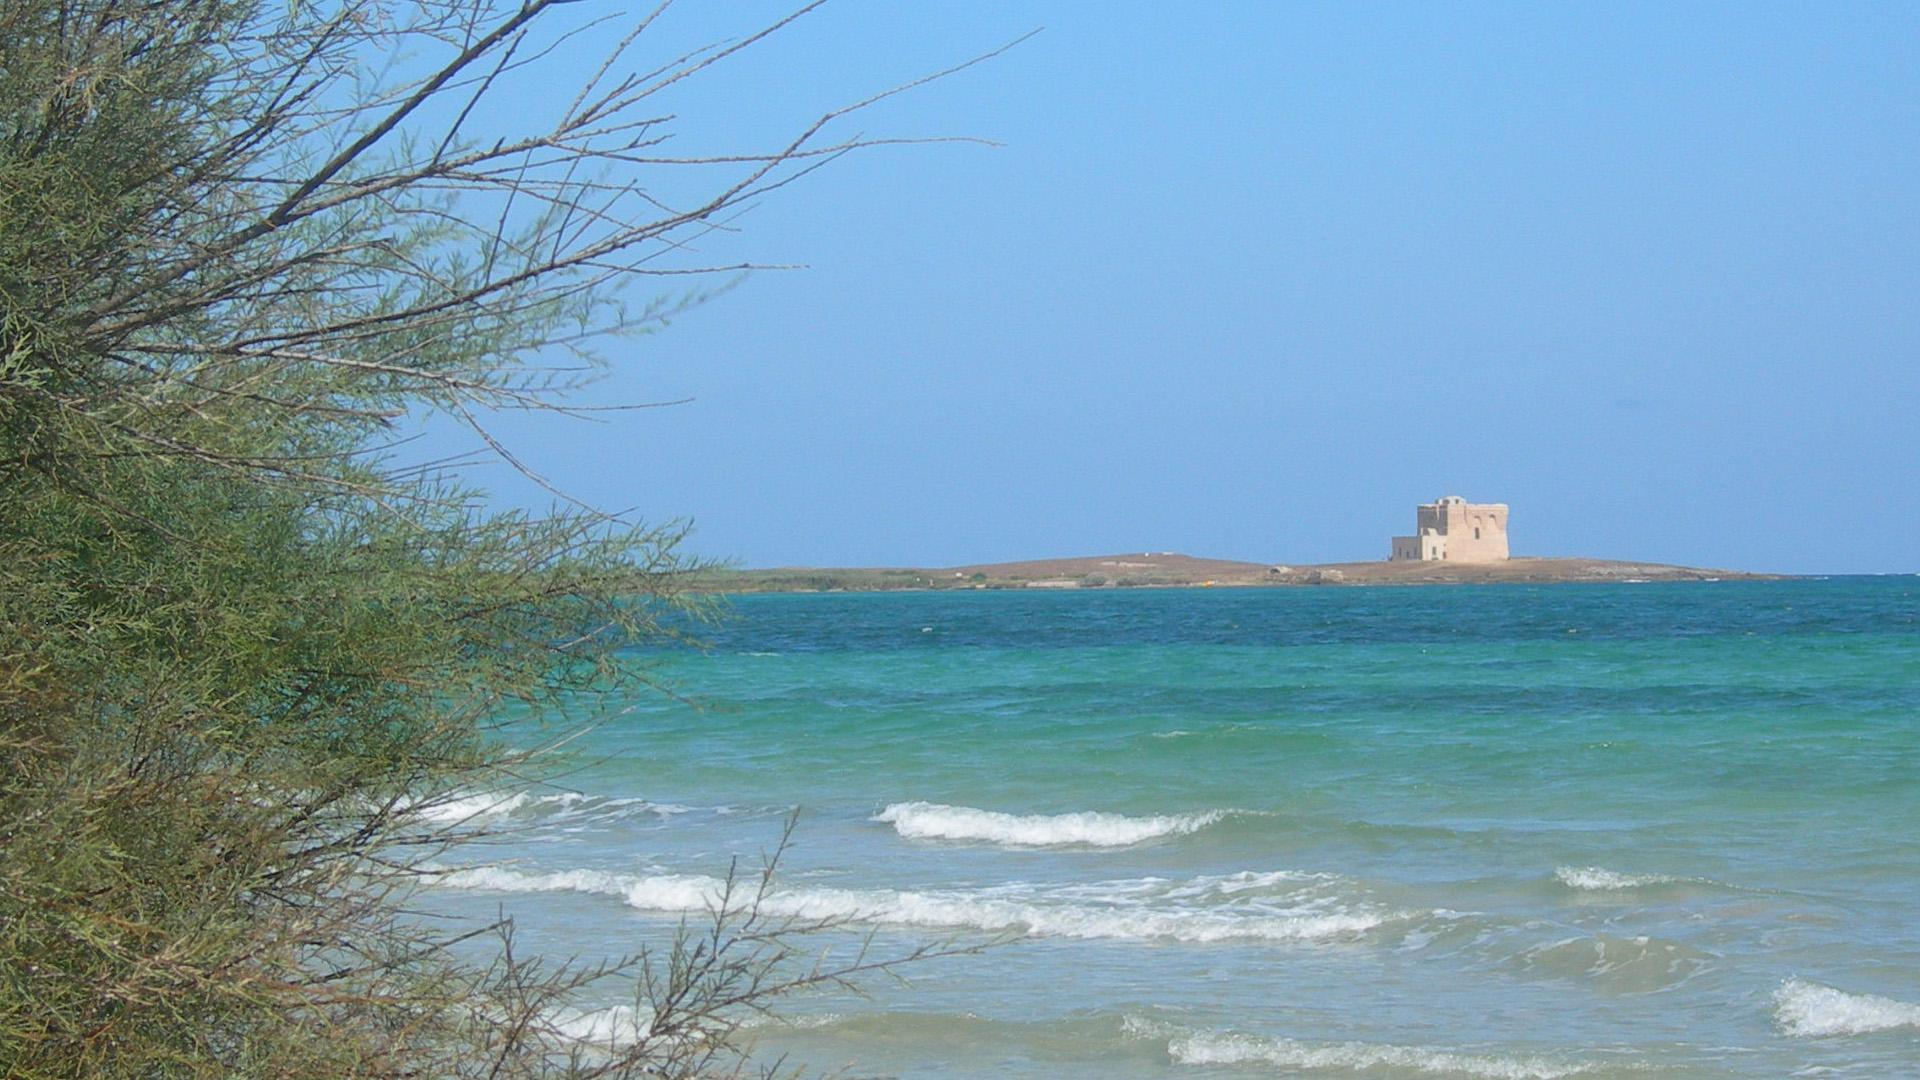 Punta Penna Grossa